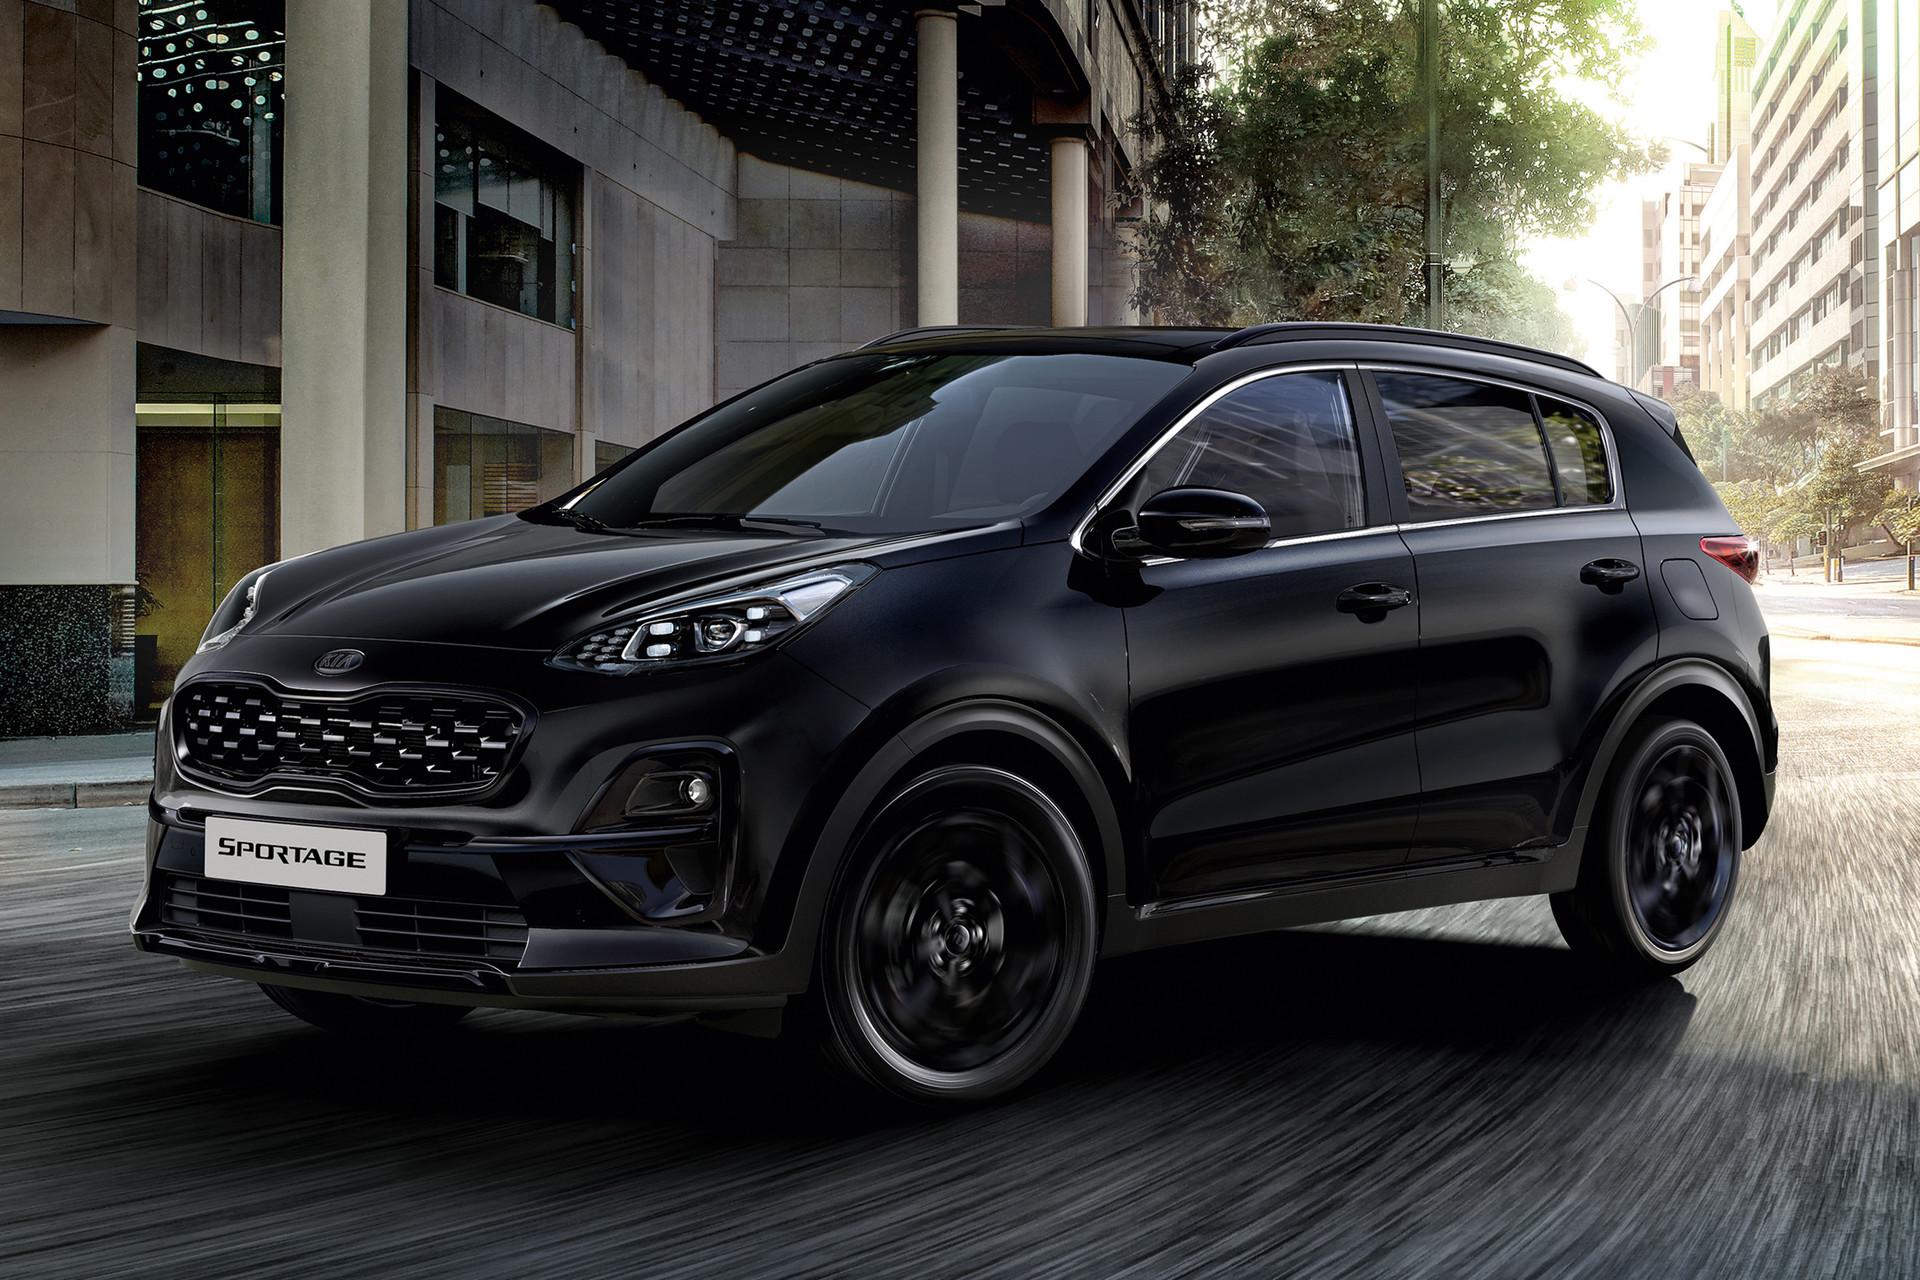 Nieuws Kia Sportage Black Edition Vanaf 41 895 Euro Autokopen Nl